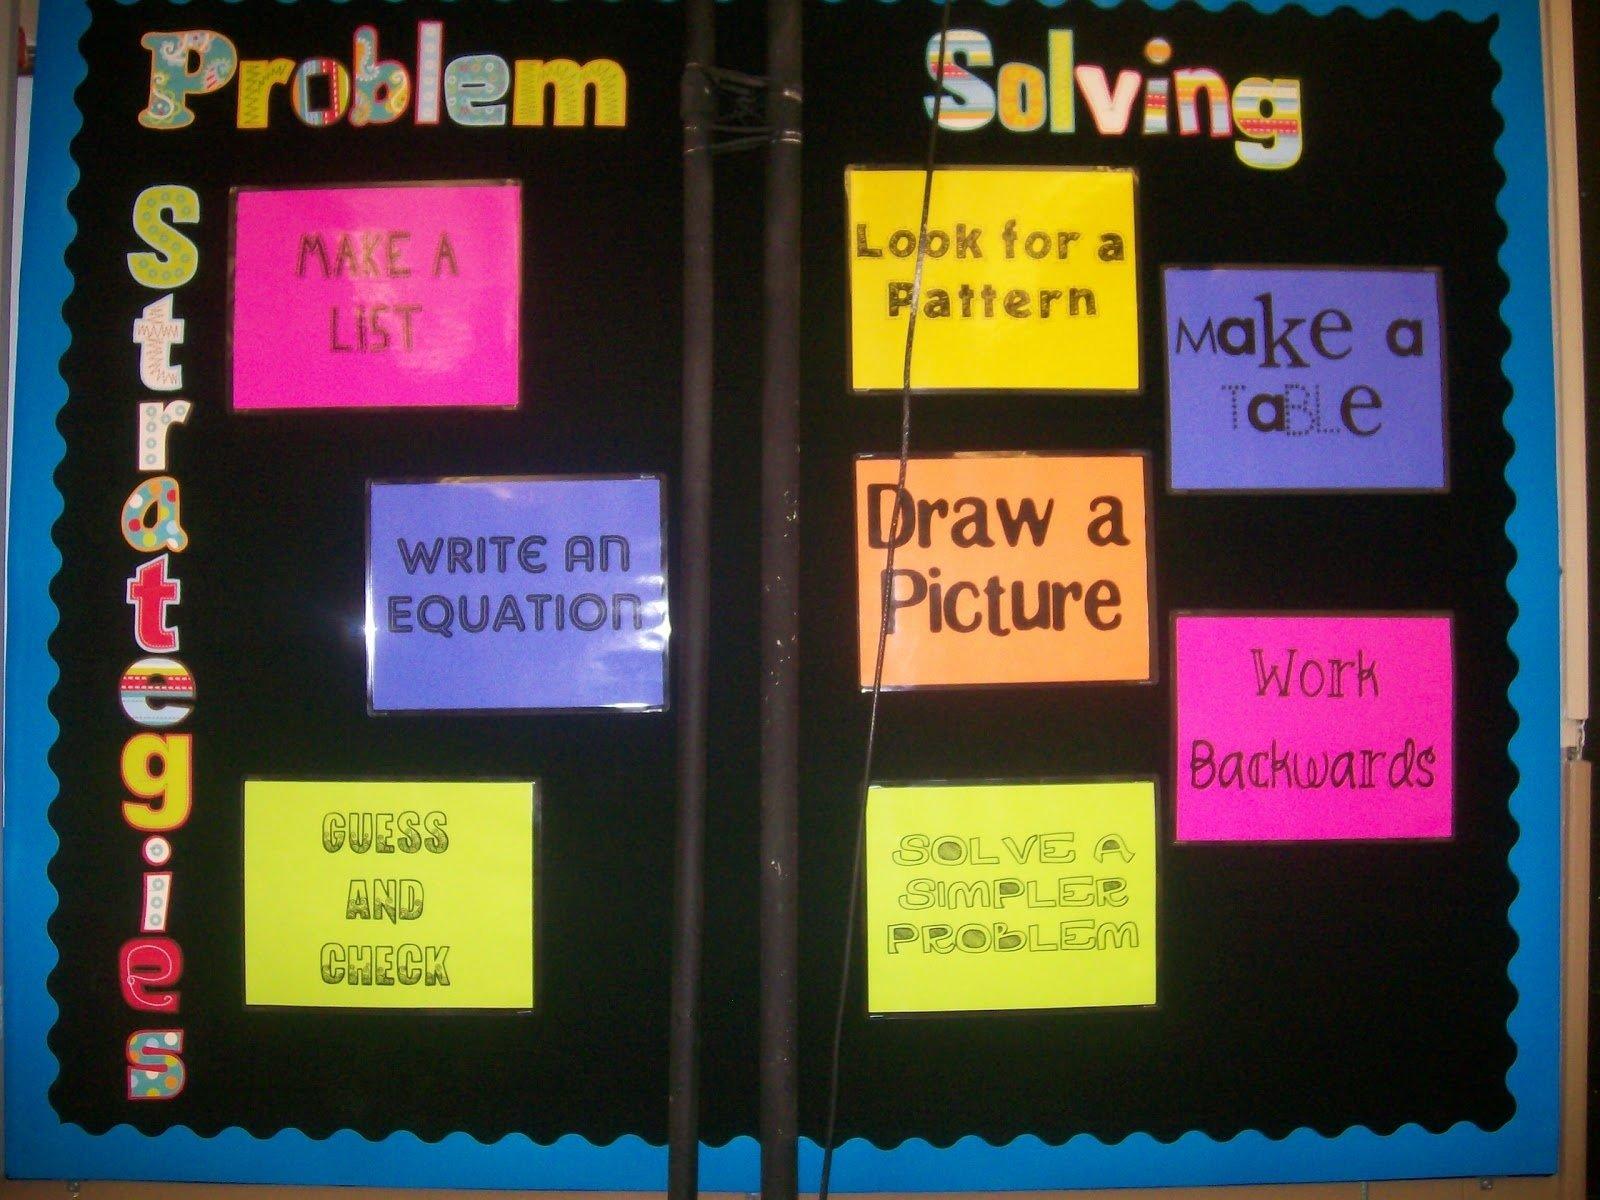 10 Attractive High School Math Bulletin Board Ideas math love problem solving strategies bulletin board 1 2020